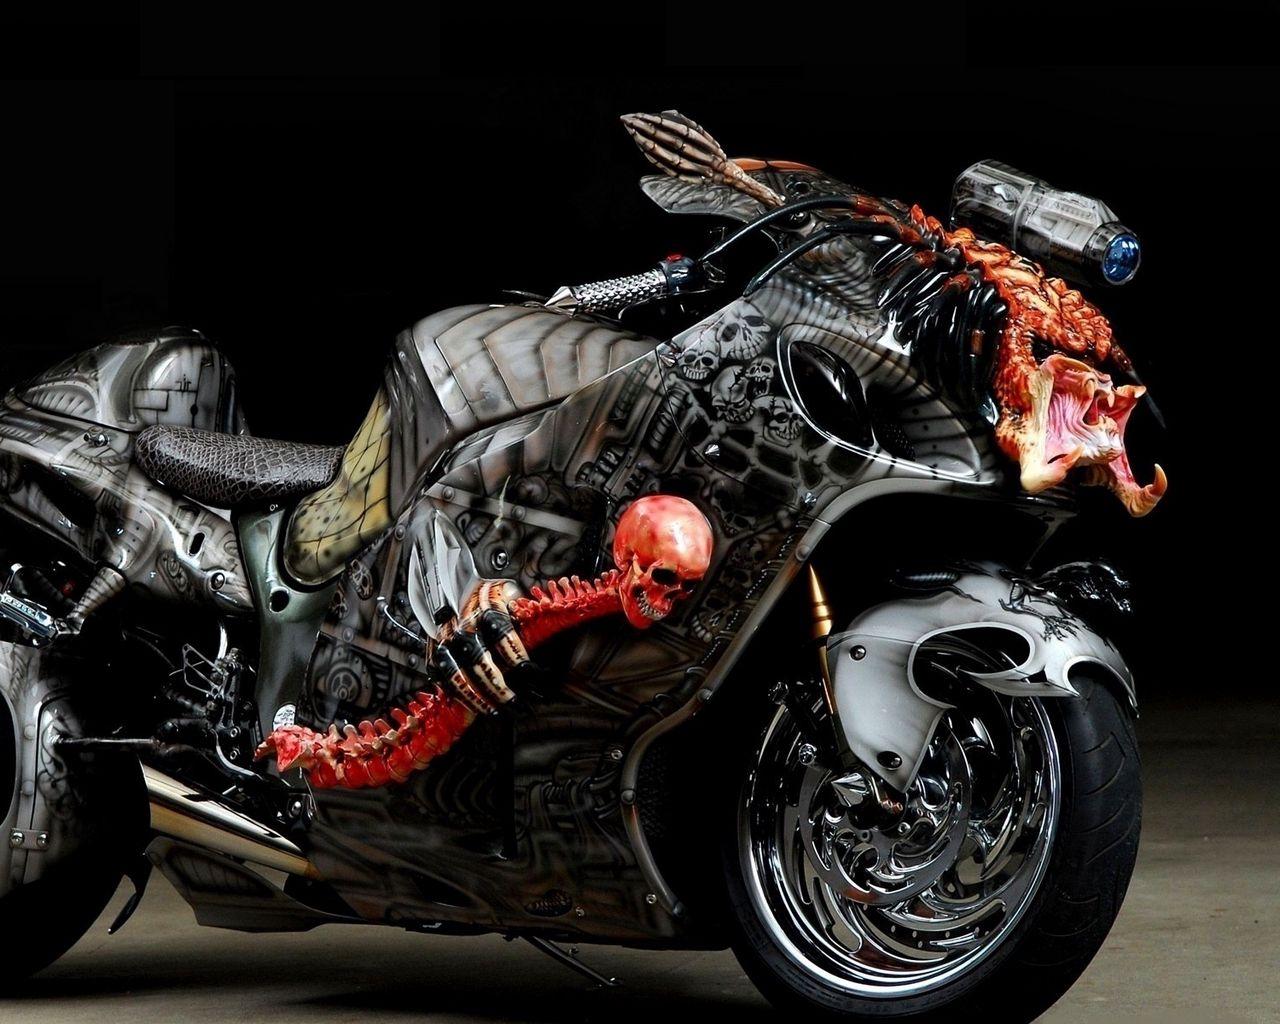 1280x1024 Wallpaper tuning, sport bike, airbrush, design